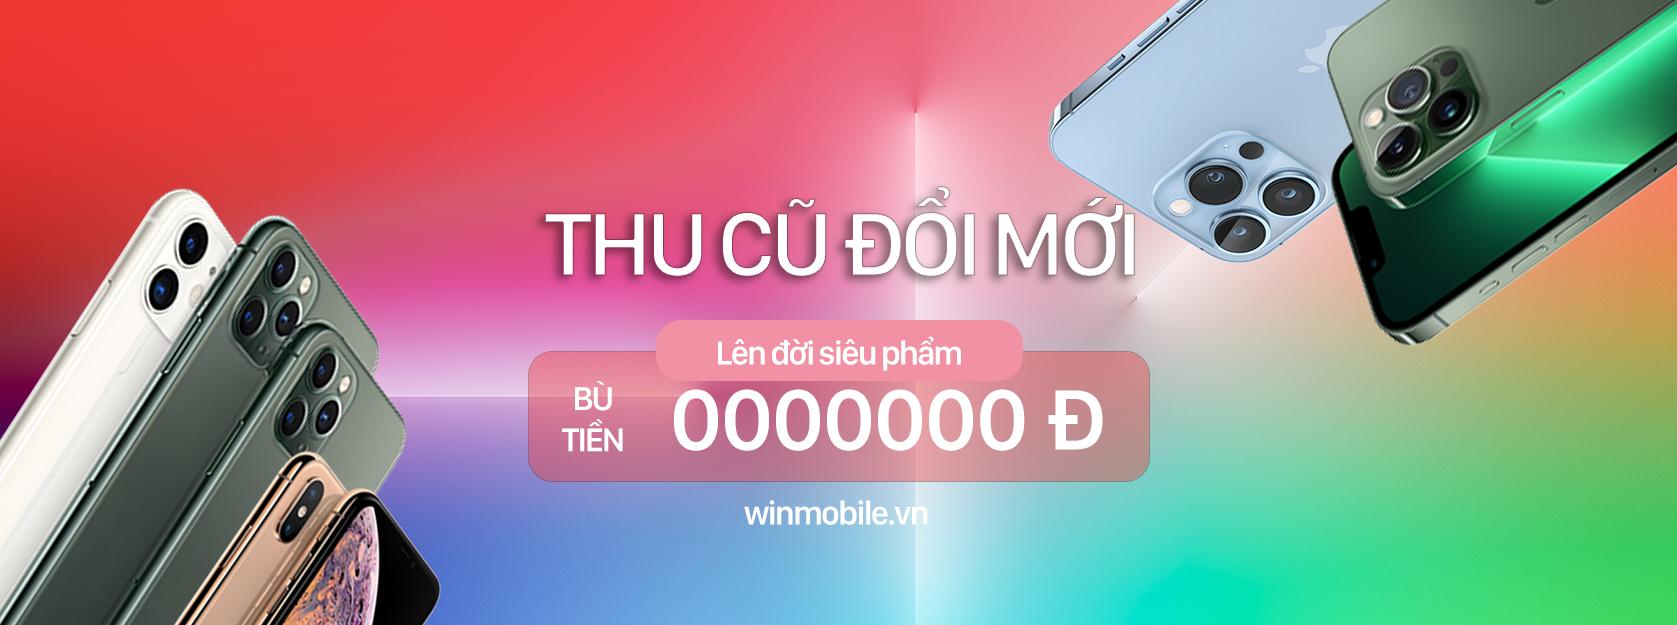 ĐỔI IPHONE 5 LẤY IPHONE 5S